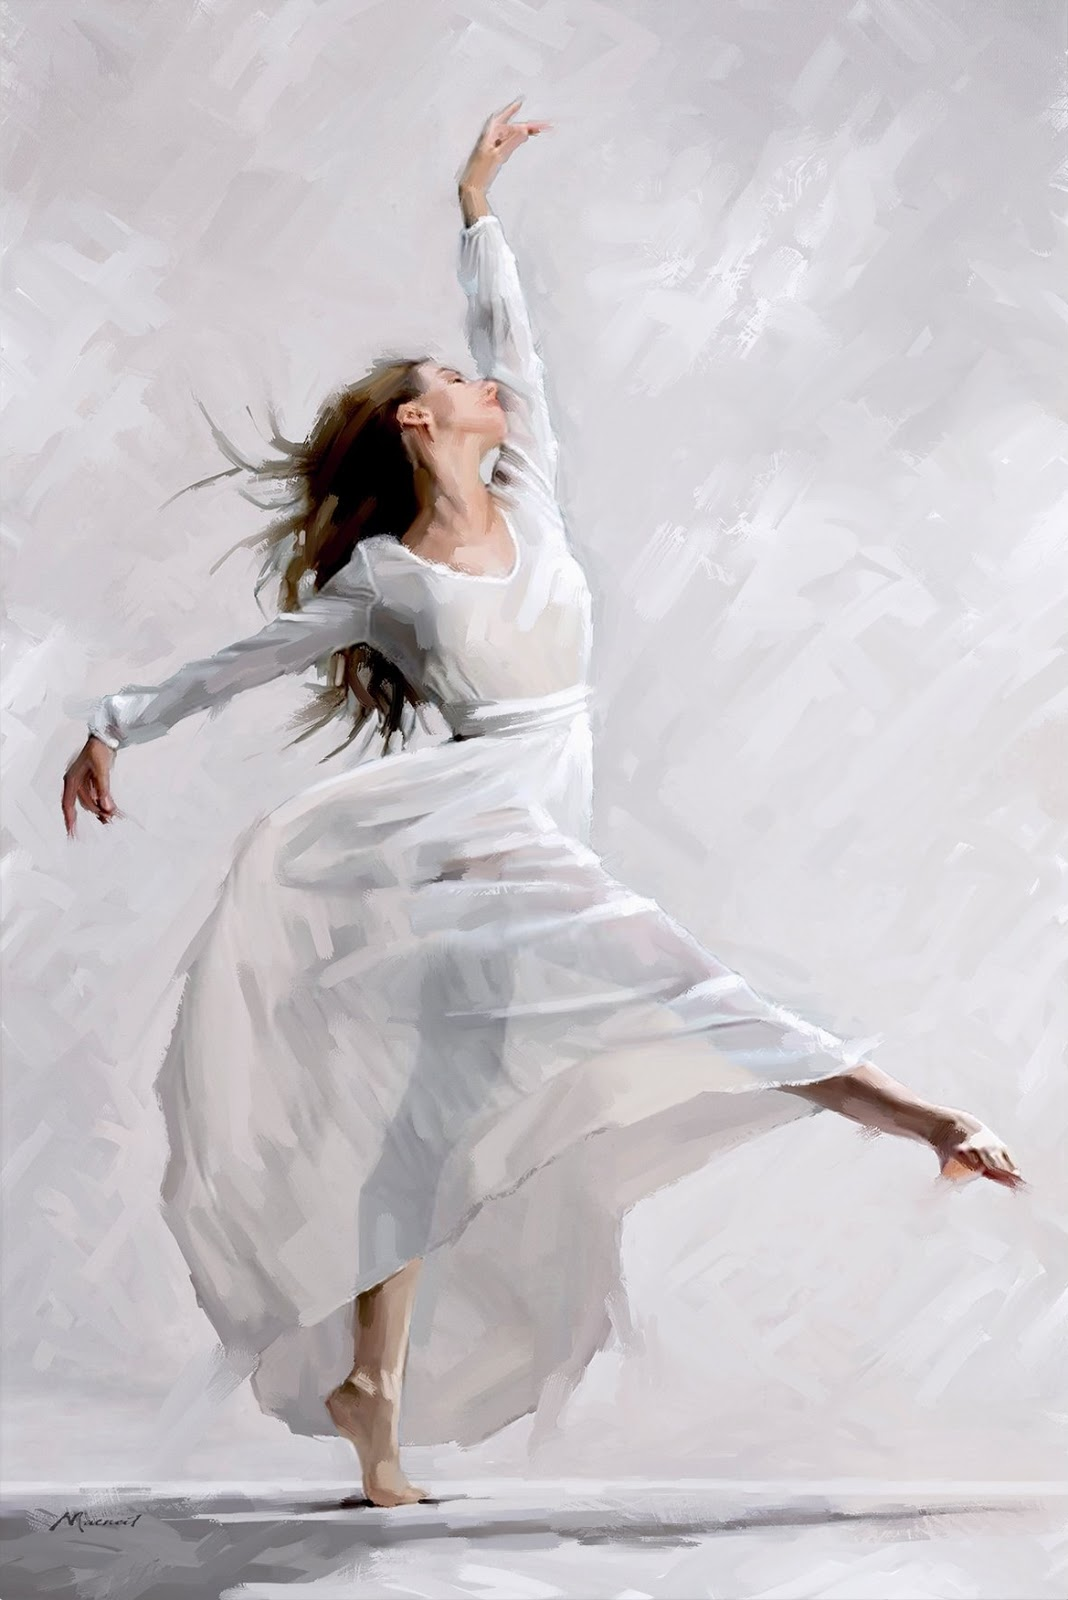 Richard Macneil Dance of the West Wind